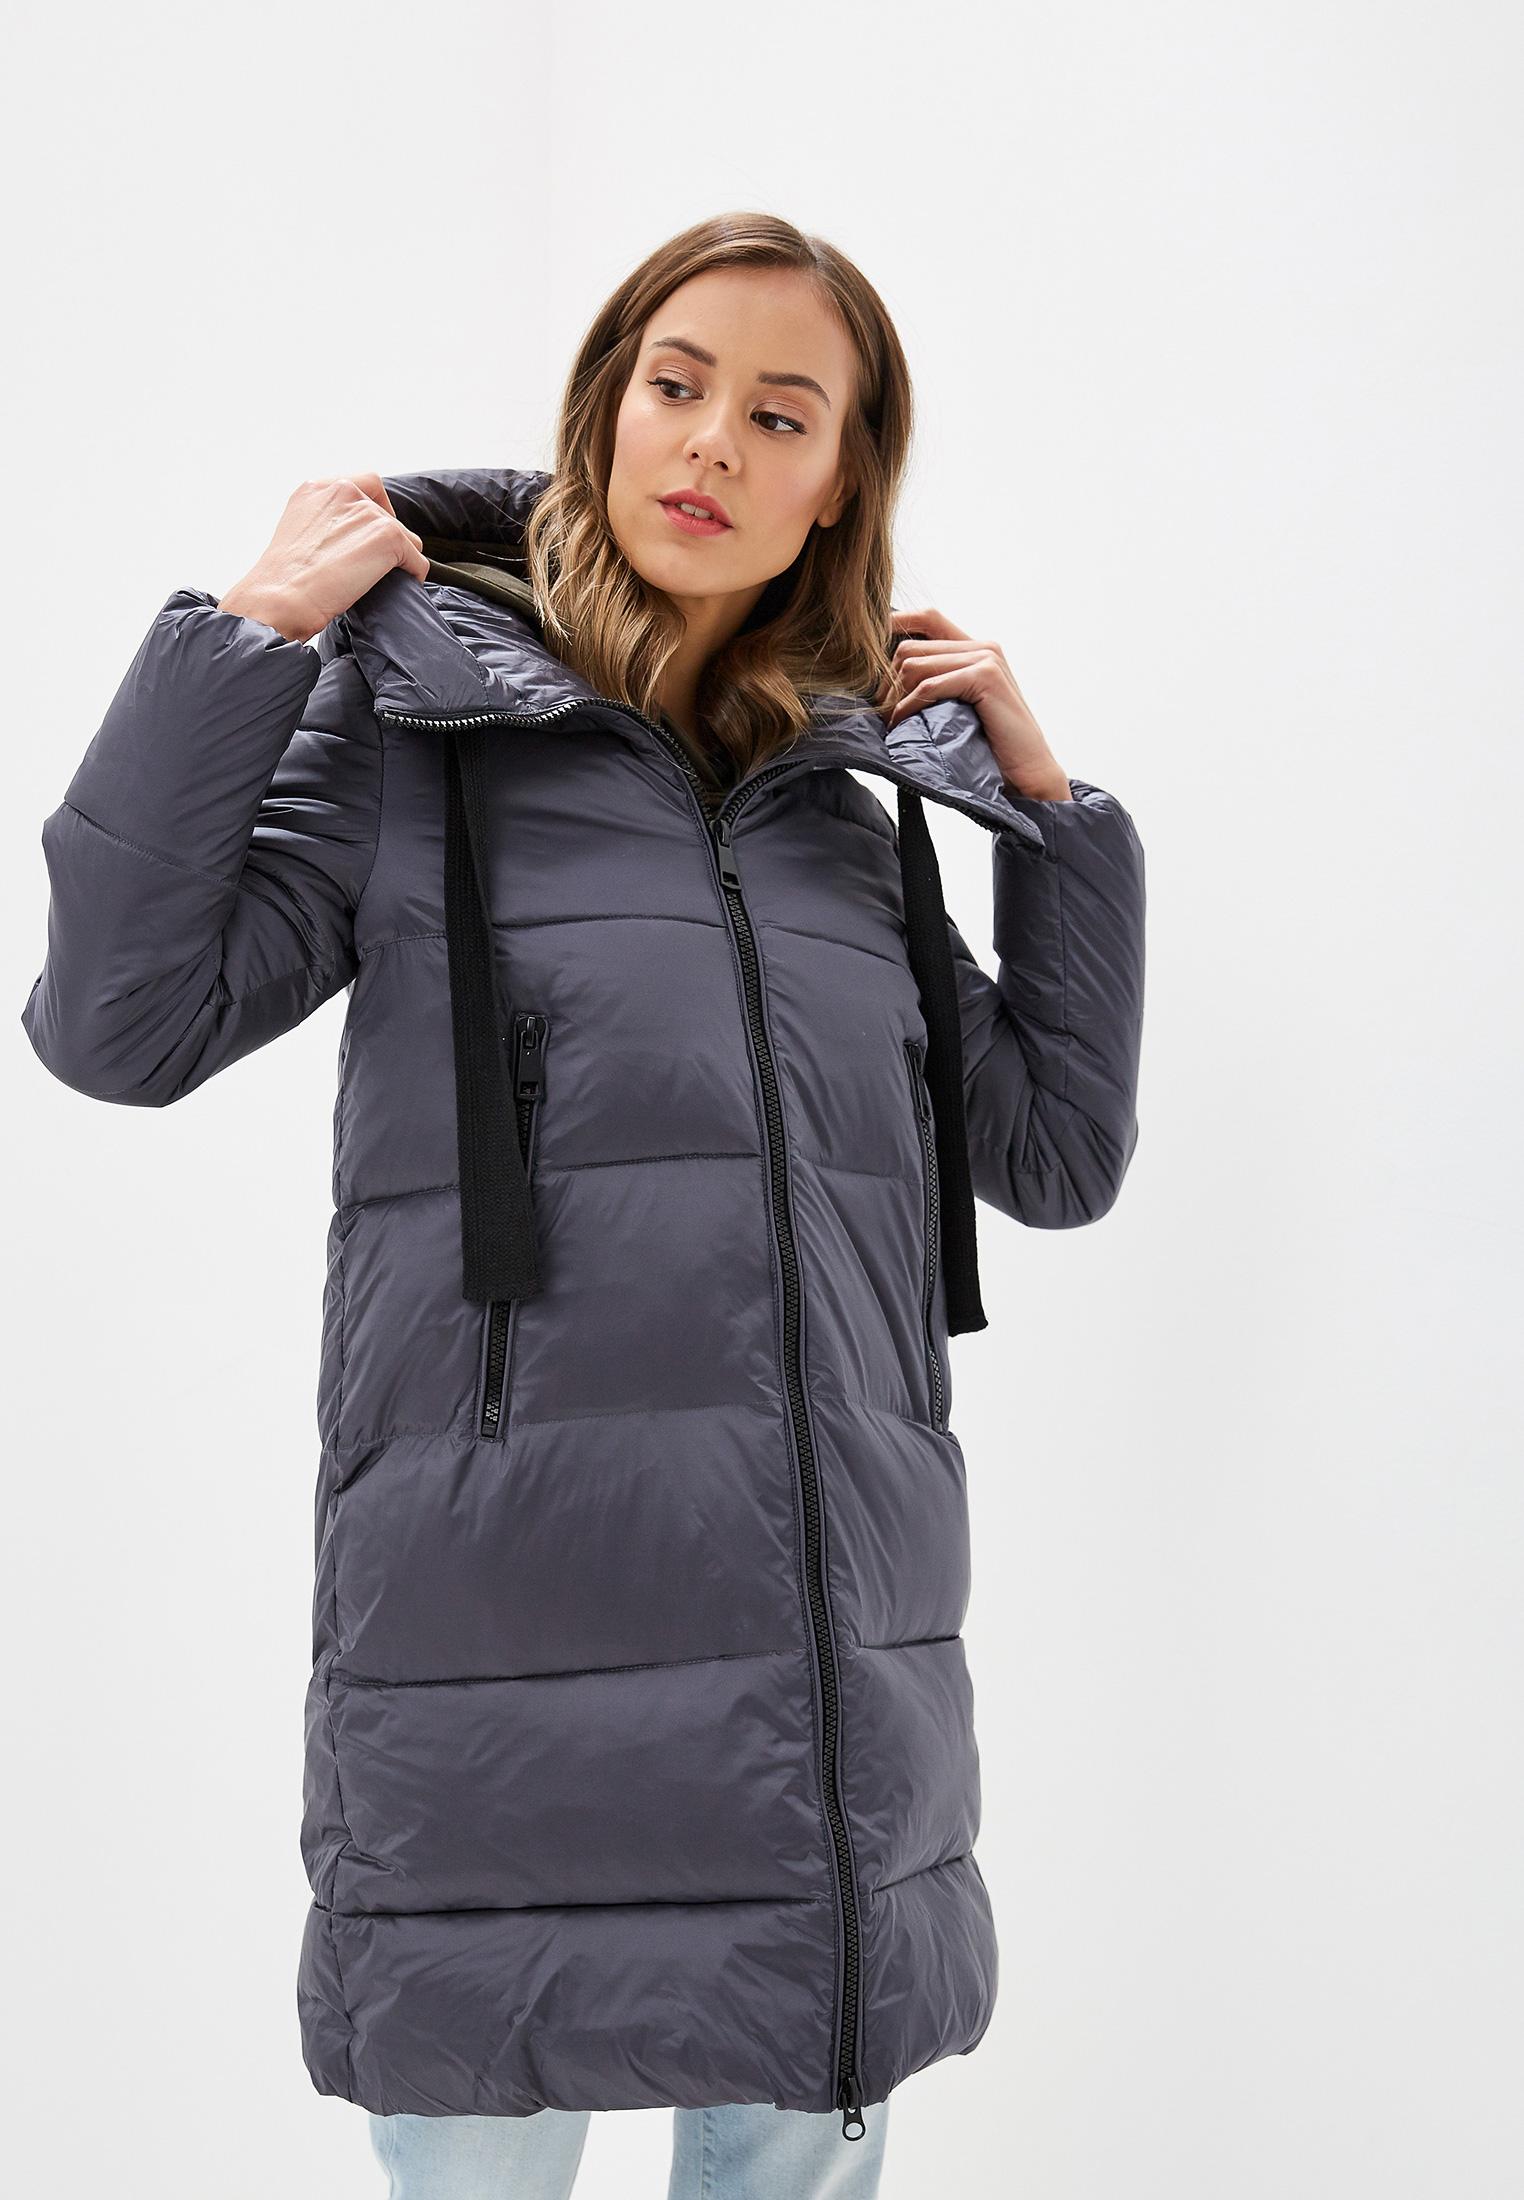 Куртка утепленная, Savage, цвет: серый. Артикул: SA004EWGESD6. Одежда / Верхняя одежда / Пуховики и зимние куртки